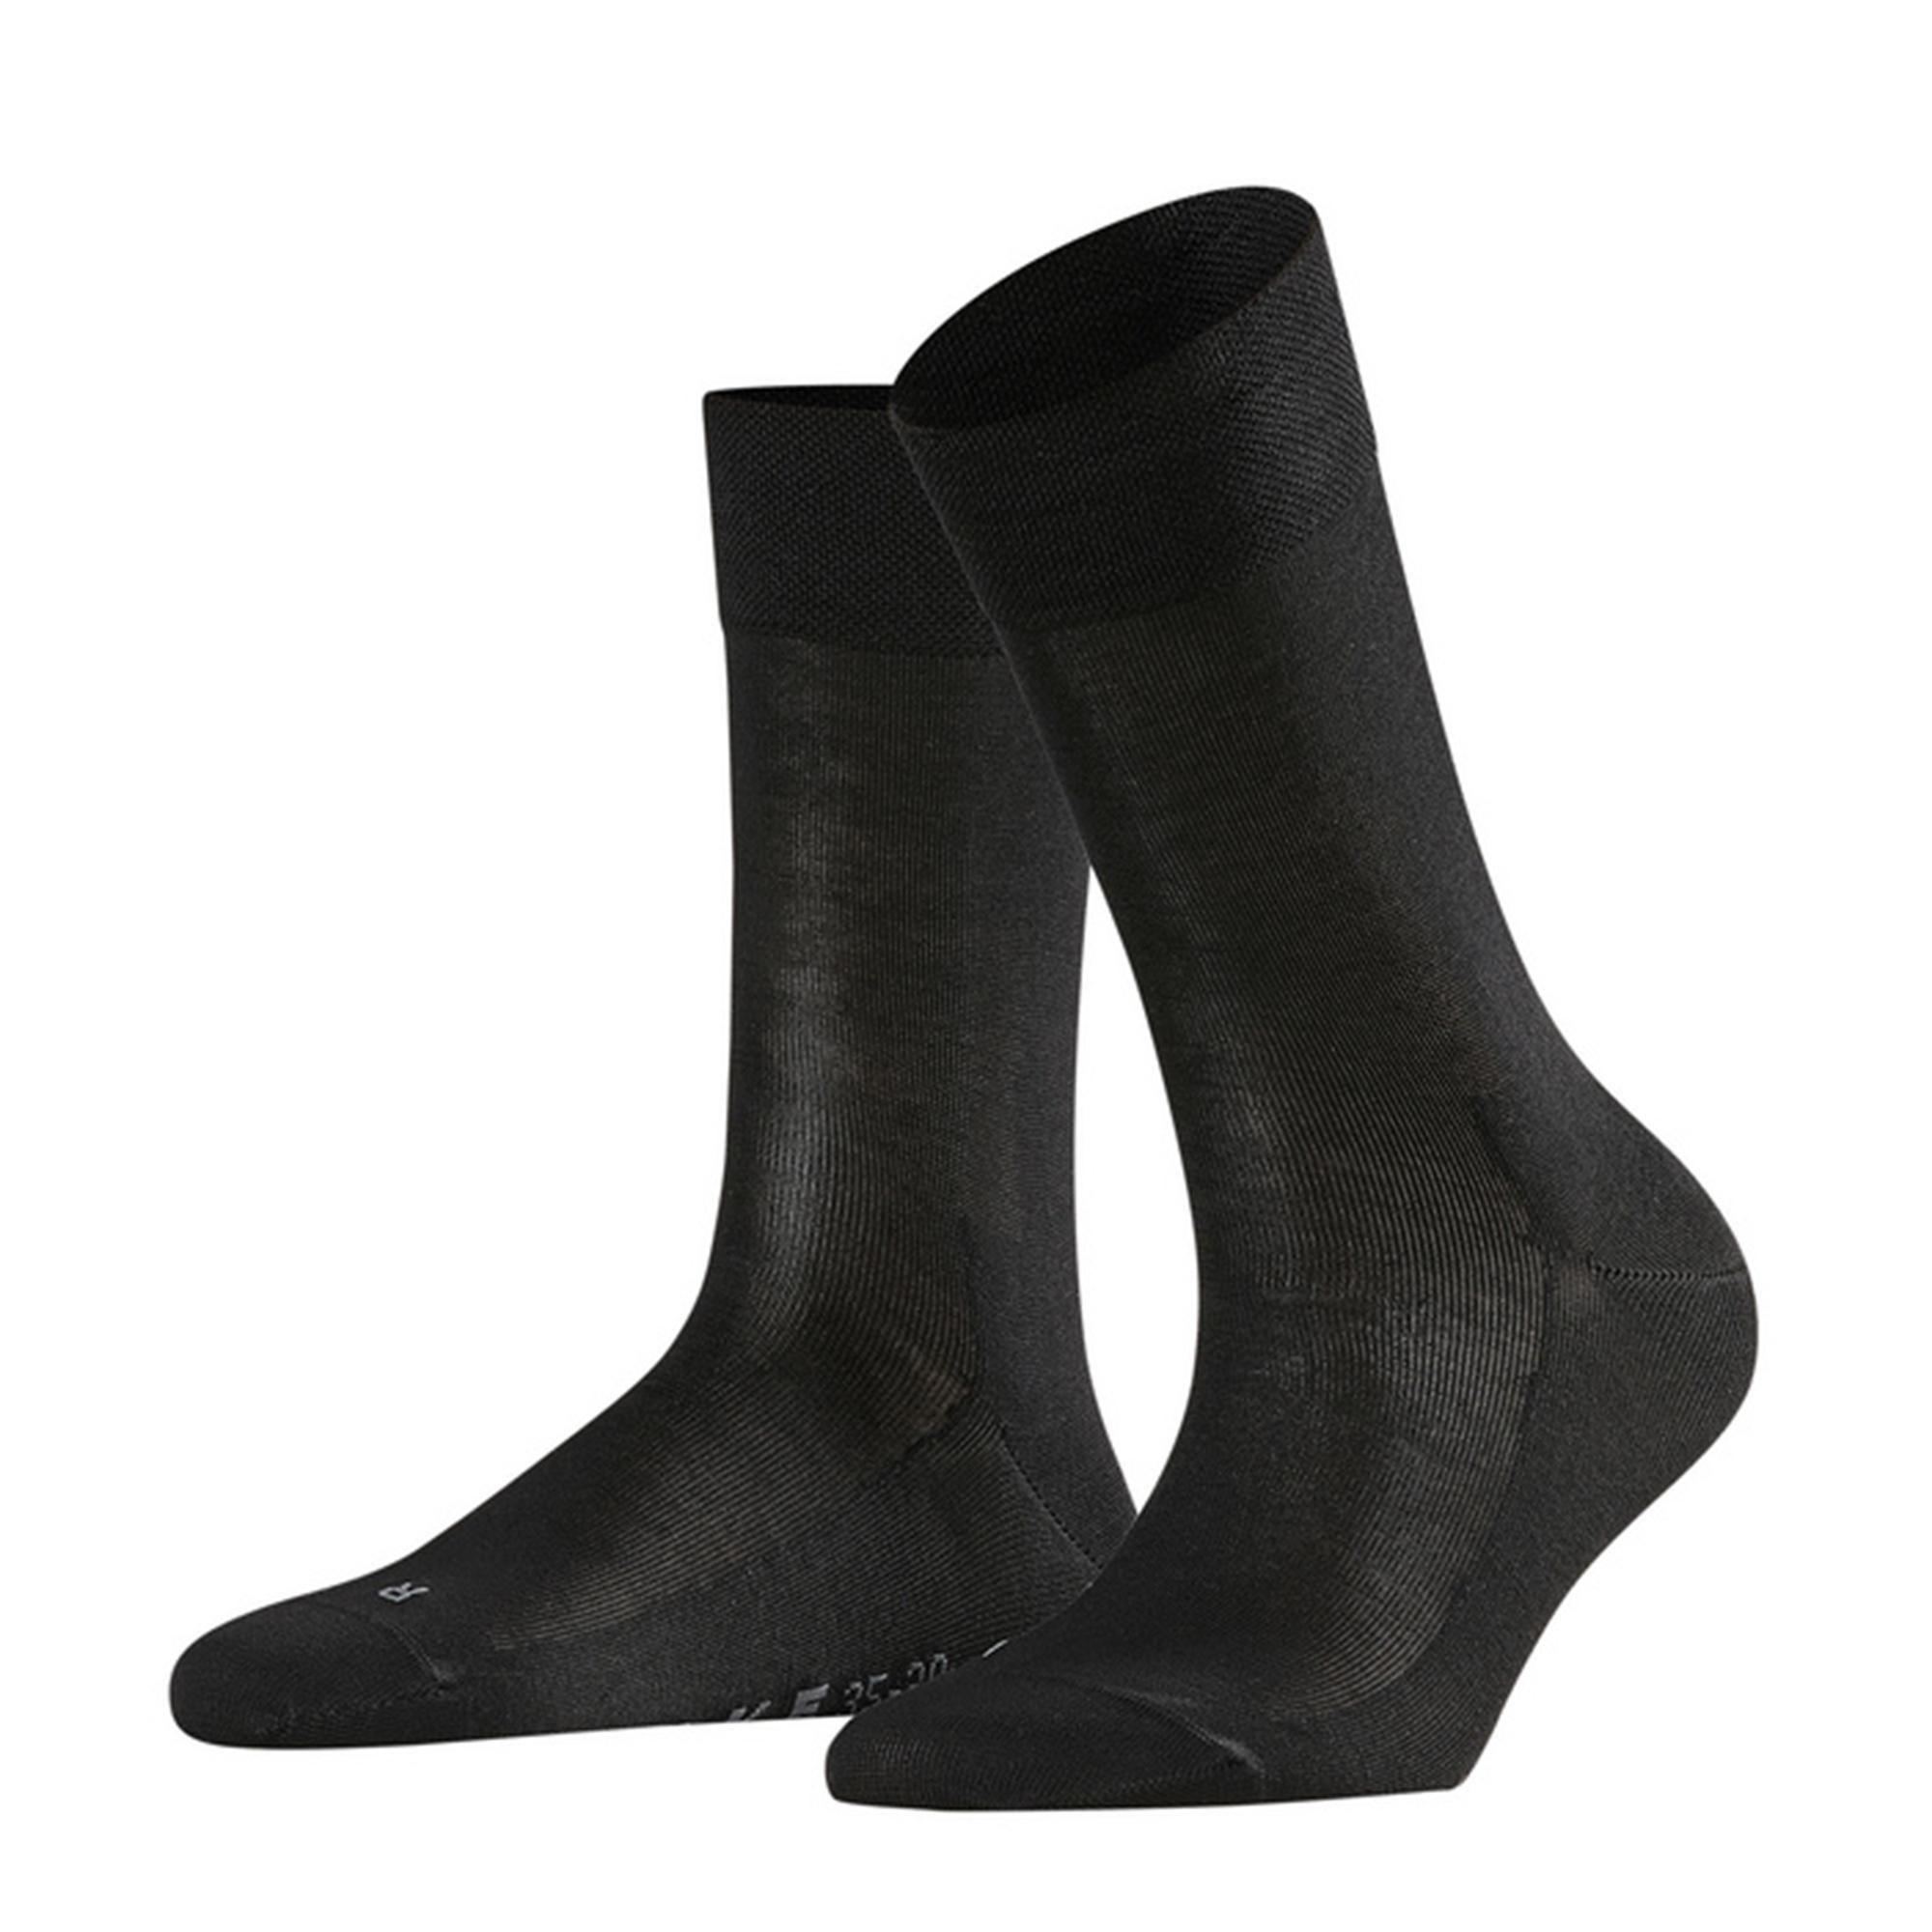 Sensitive Malaga socks